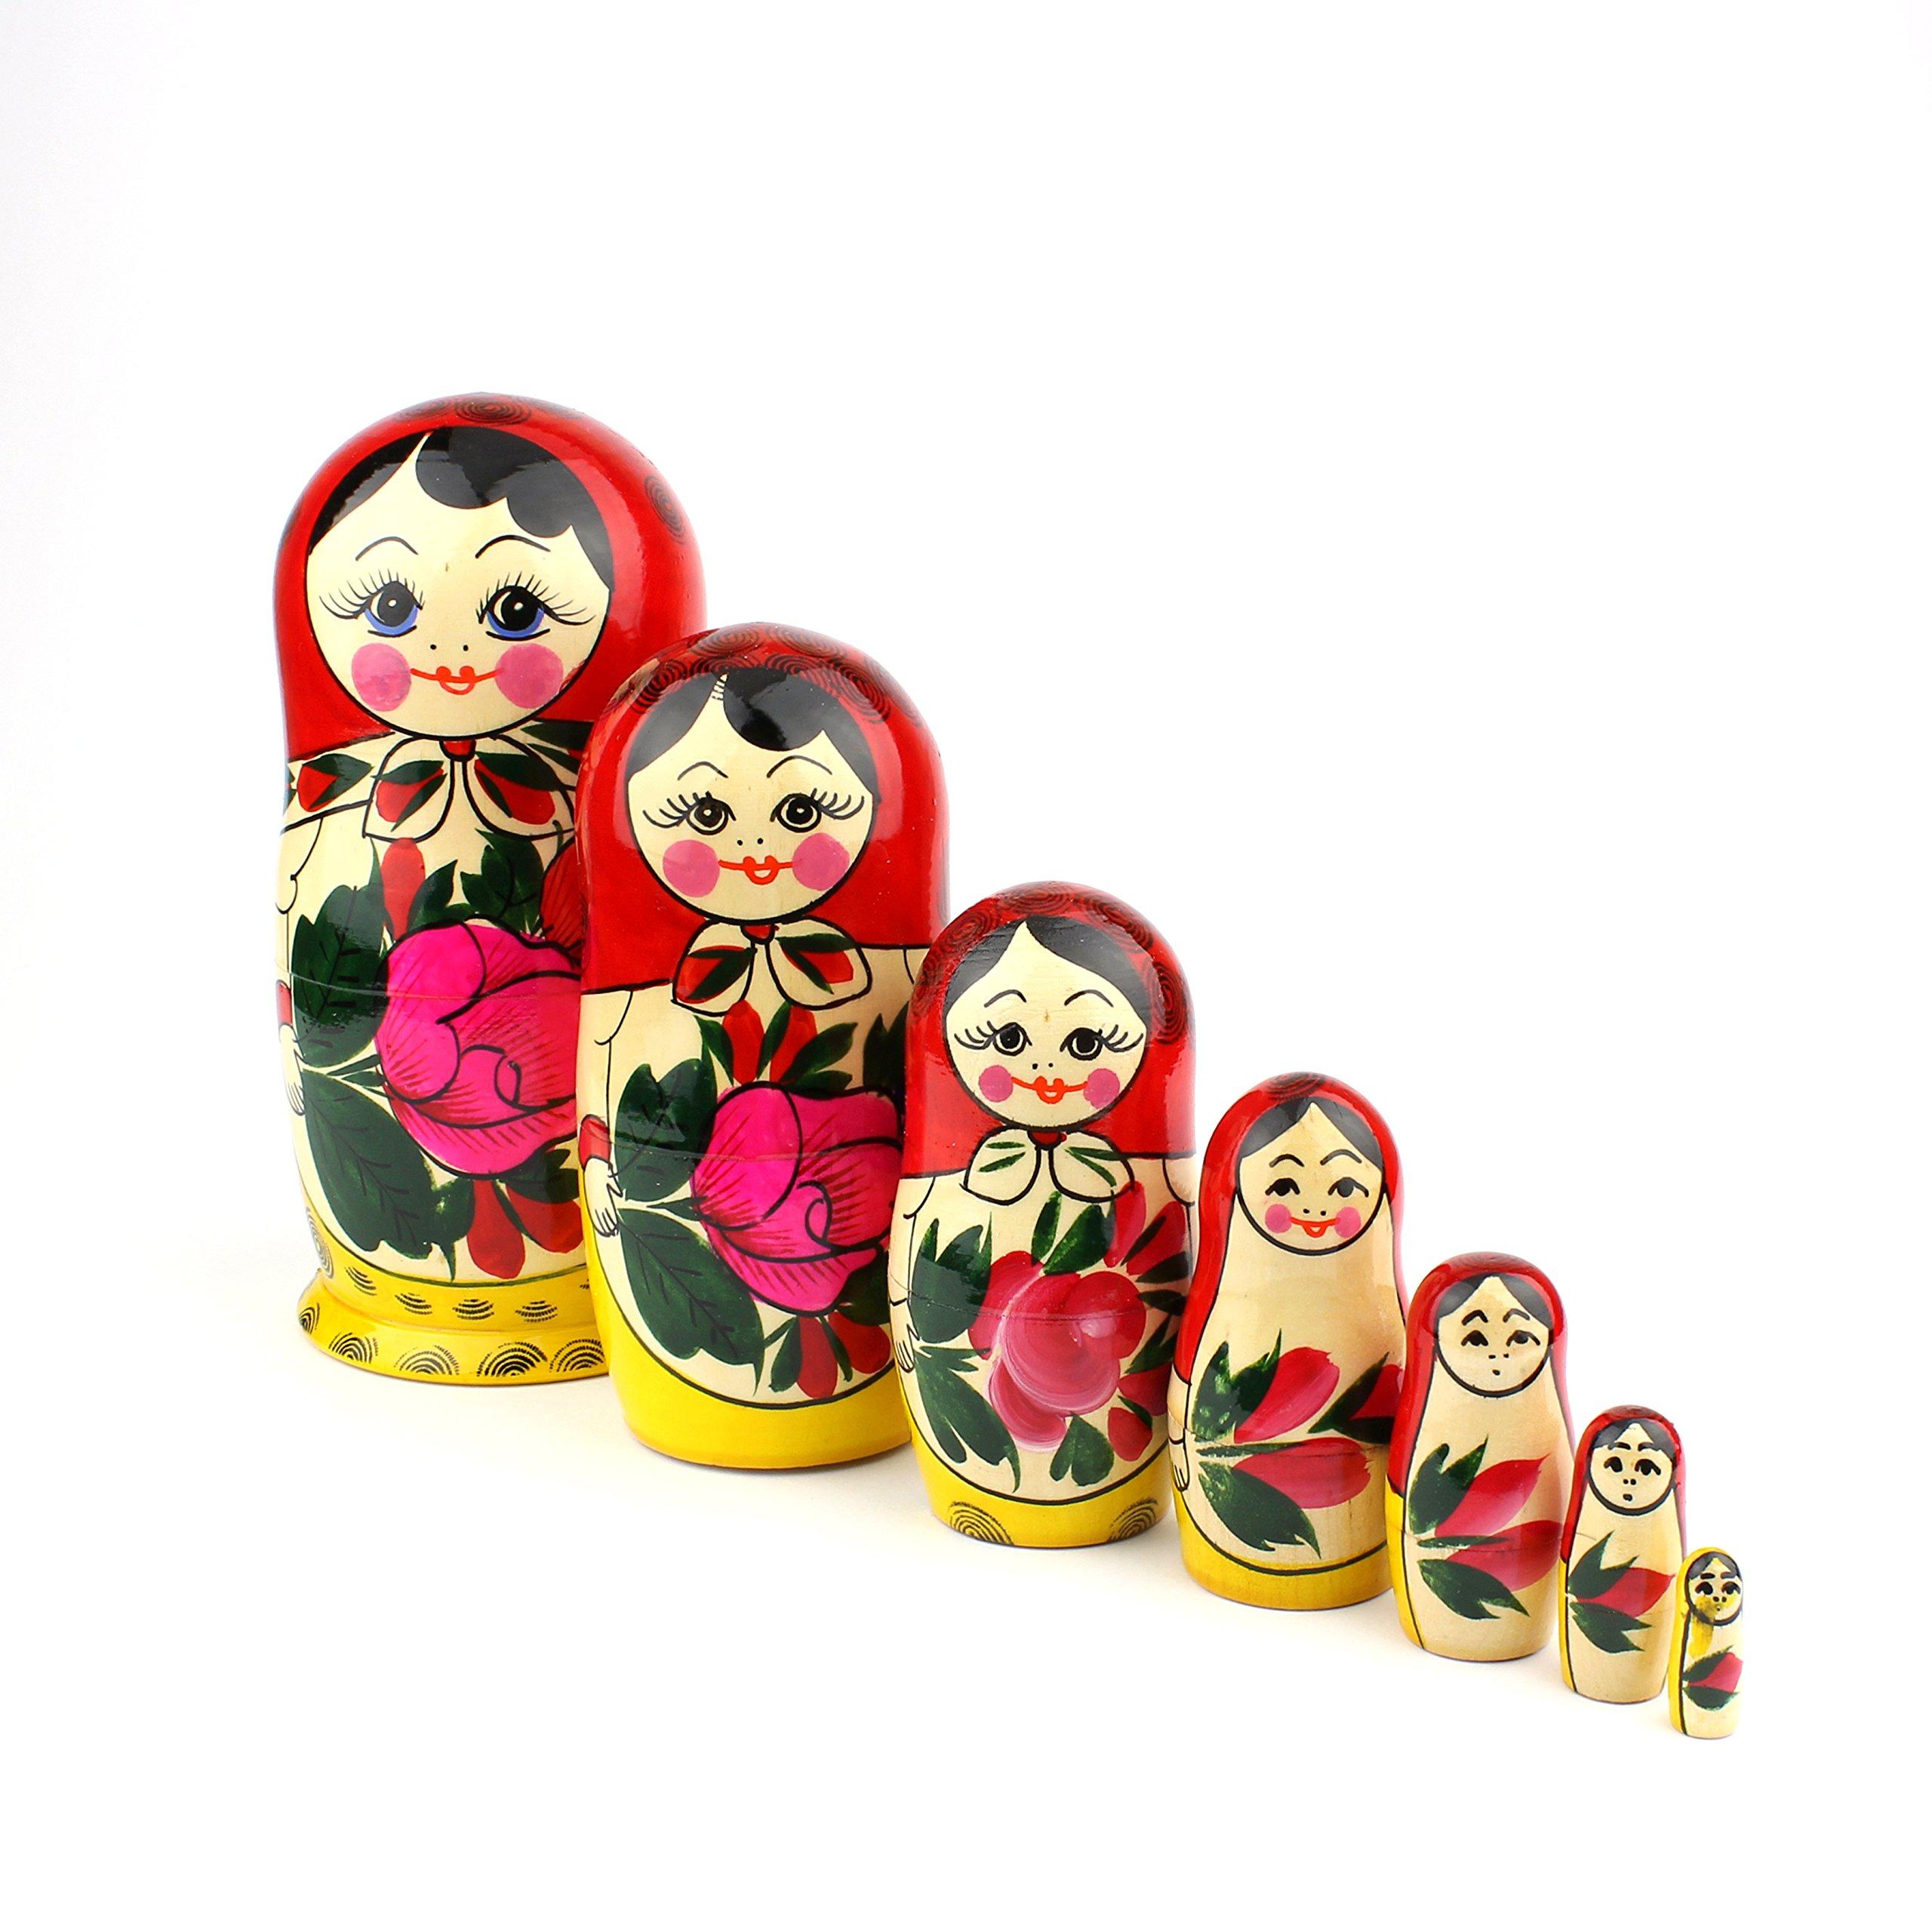 "Heka Naturals Matryoshka Russian Nesting Dolls Semenov Classic Babushka Hand Made in Russia Red Top Wooden Gift Toy (7 dolls (7""x3""))"